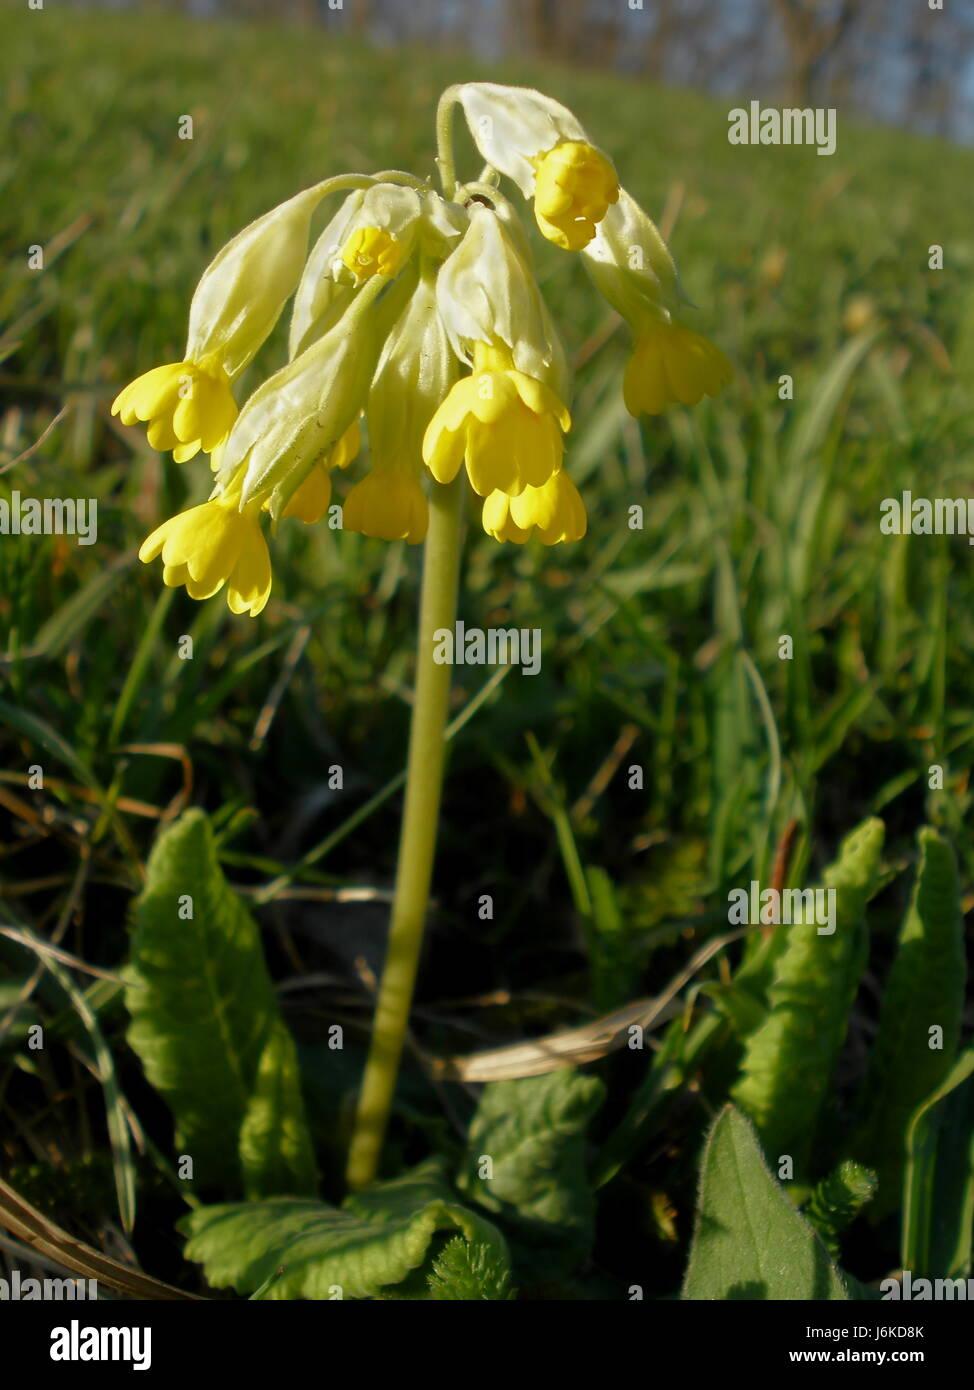 grüne Blüten bluten Primel Wiese Rasen Rasen gelb grüne Blüten ...